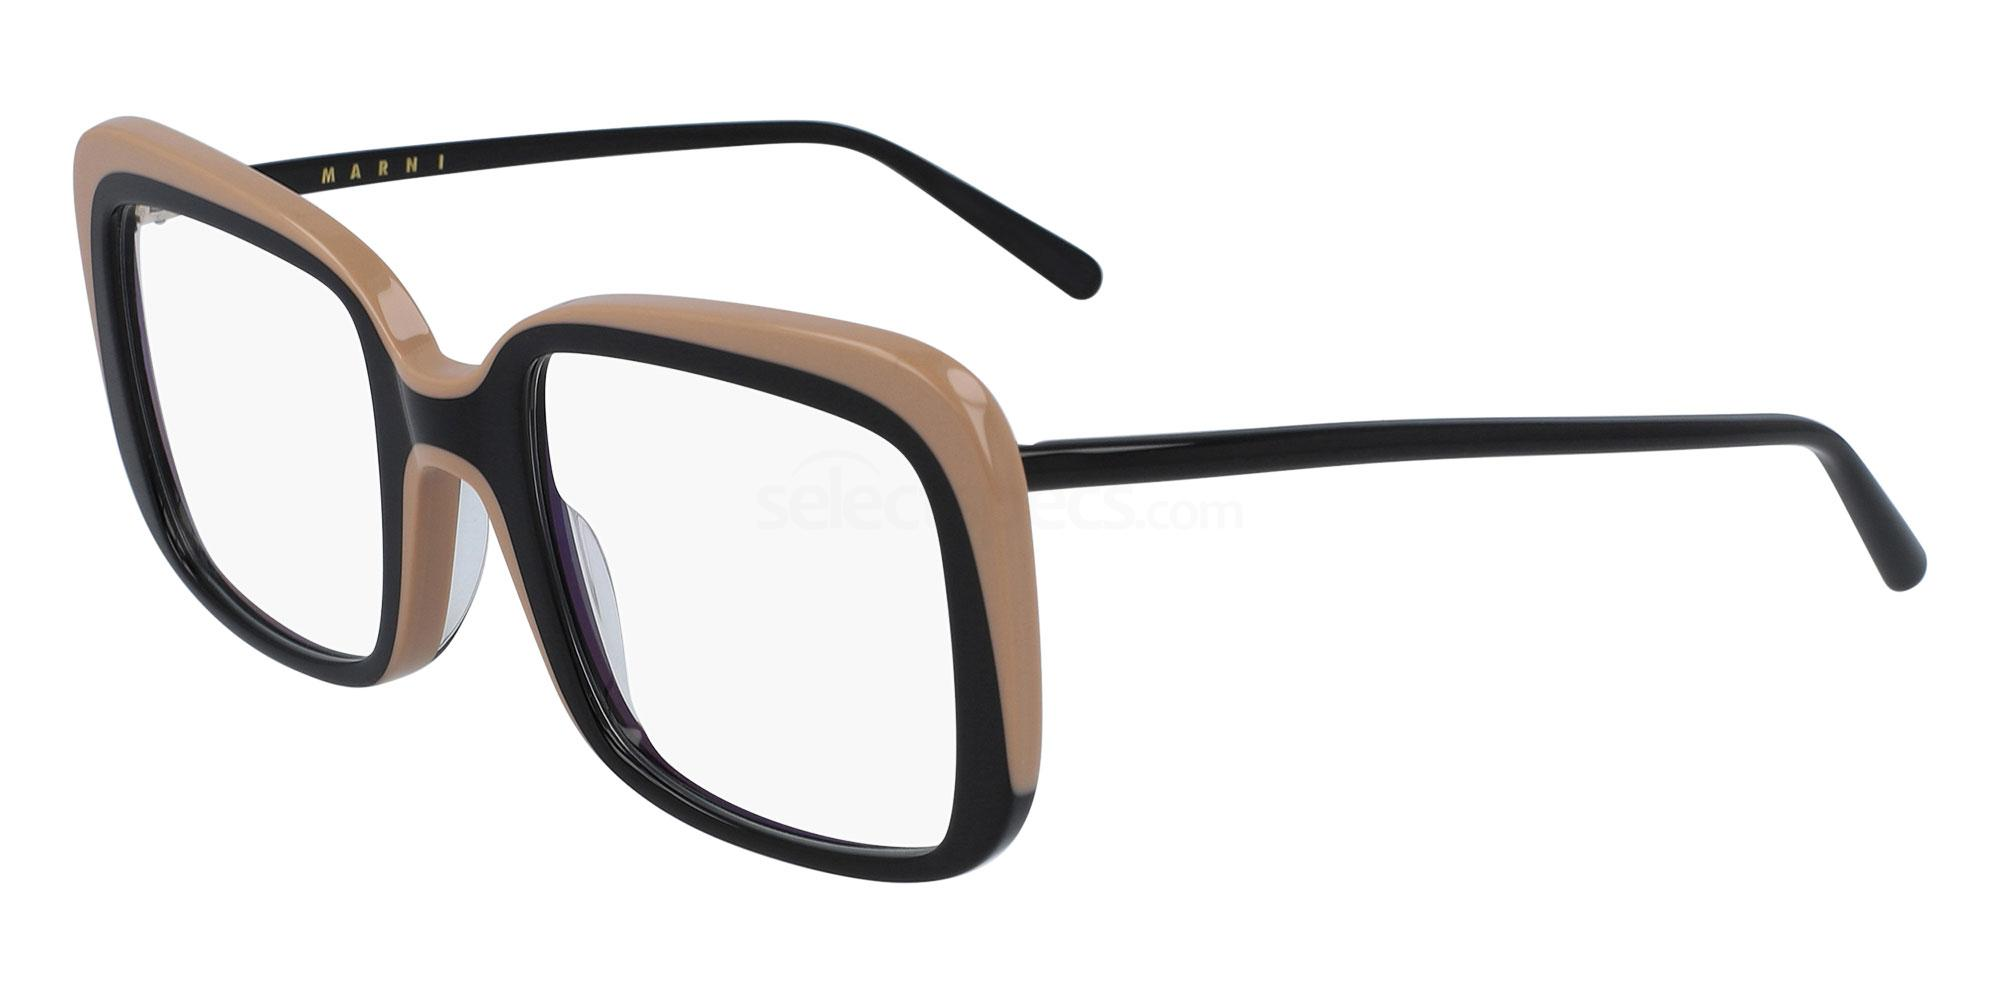 010 ME2623 Glasses, Marni